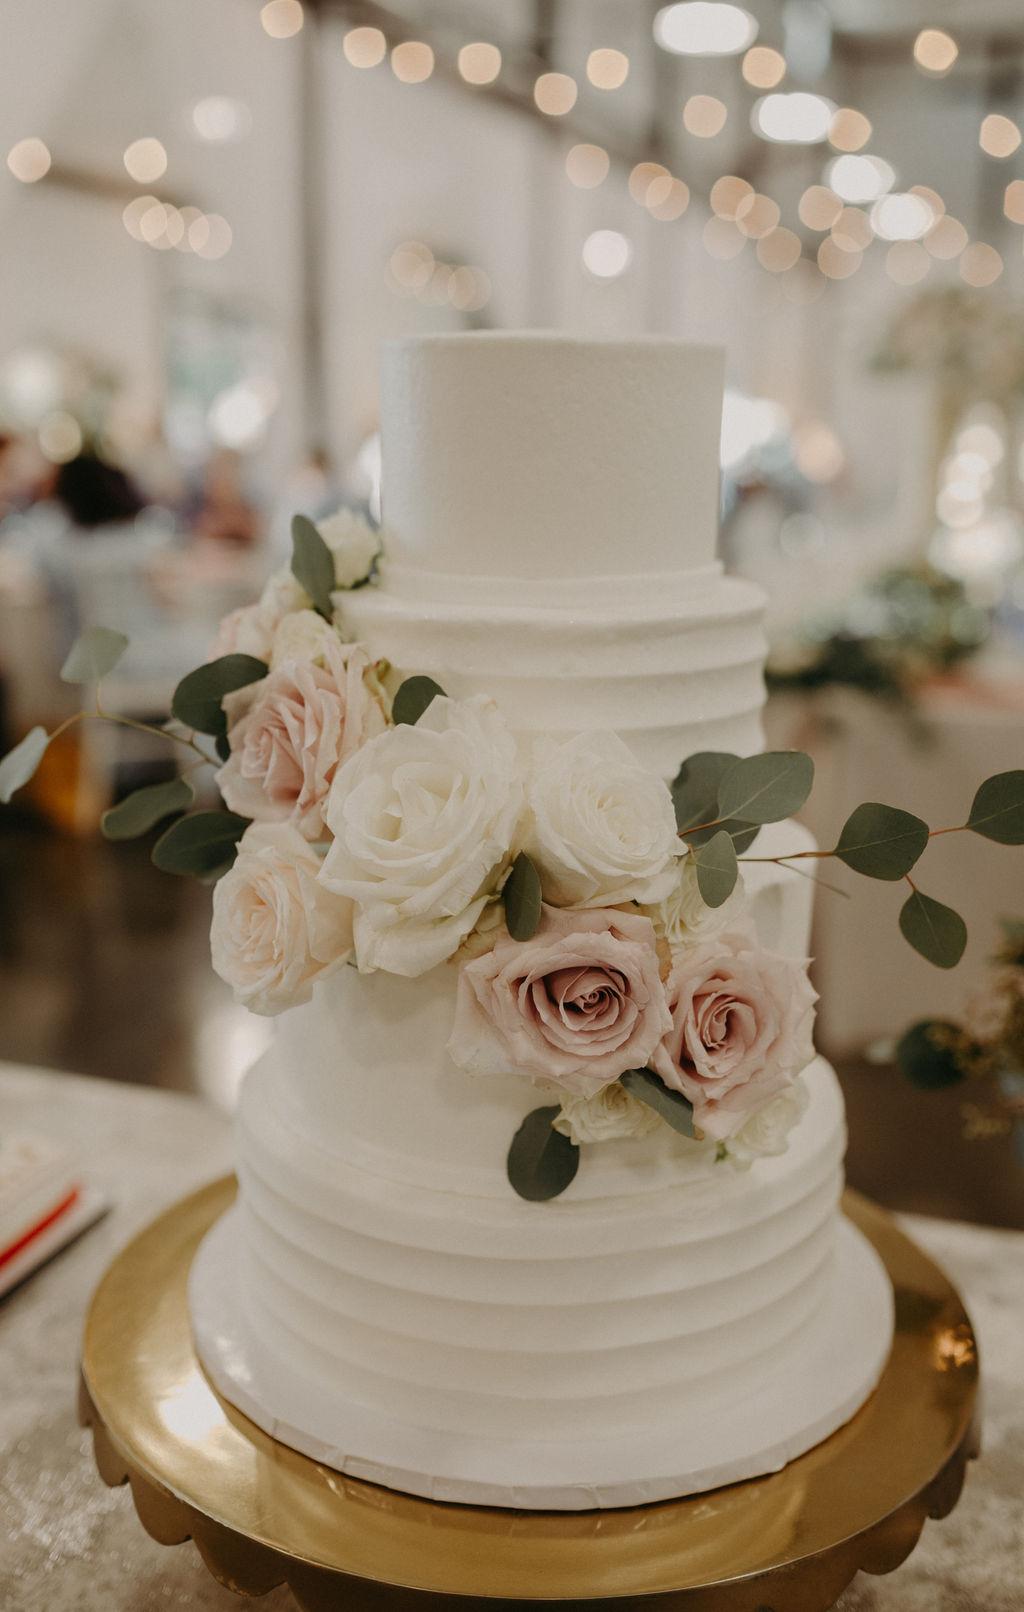 Best Oklahoma Outdoor Wedding Venue Tulsa Bixby White Barn 66.jpg